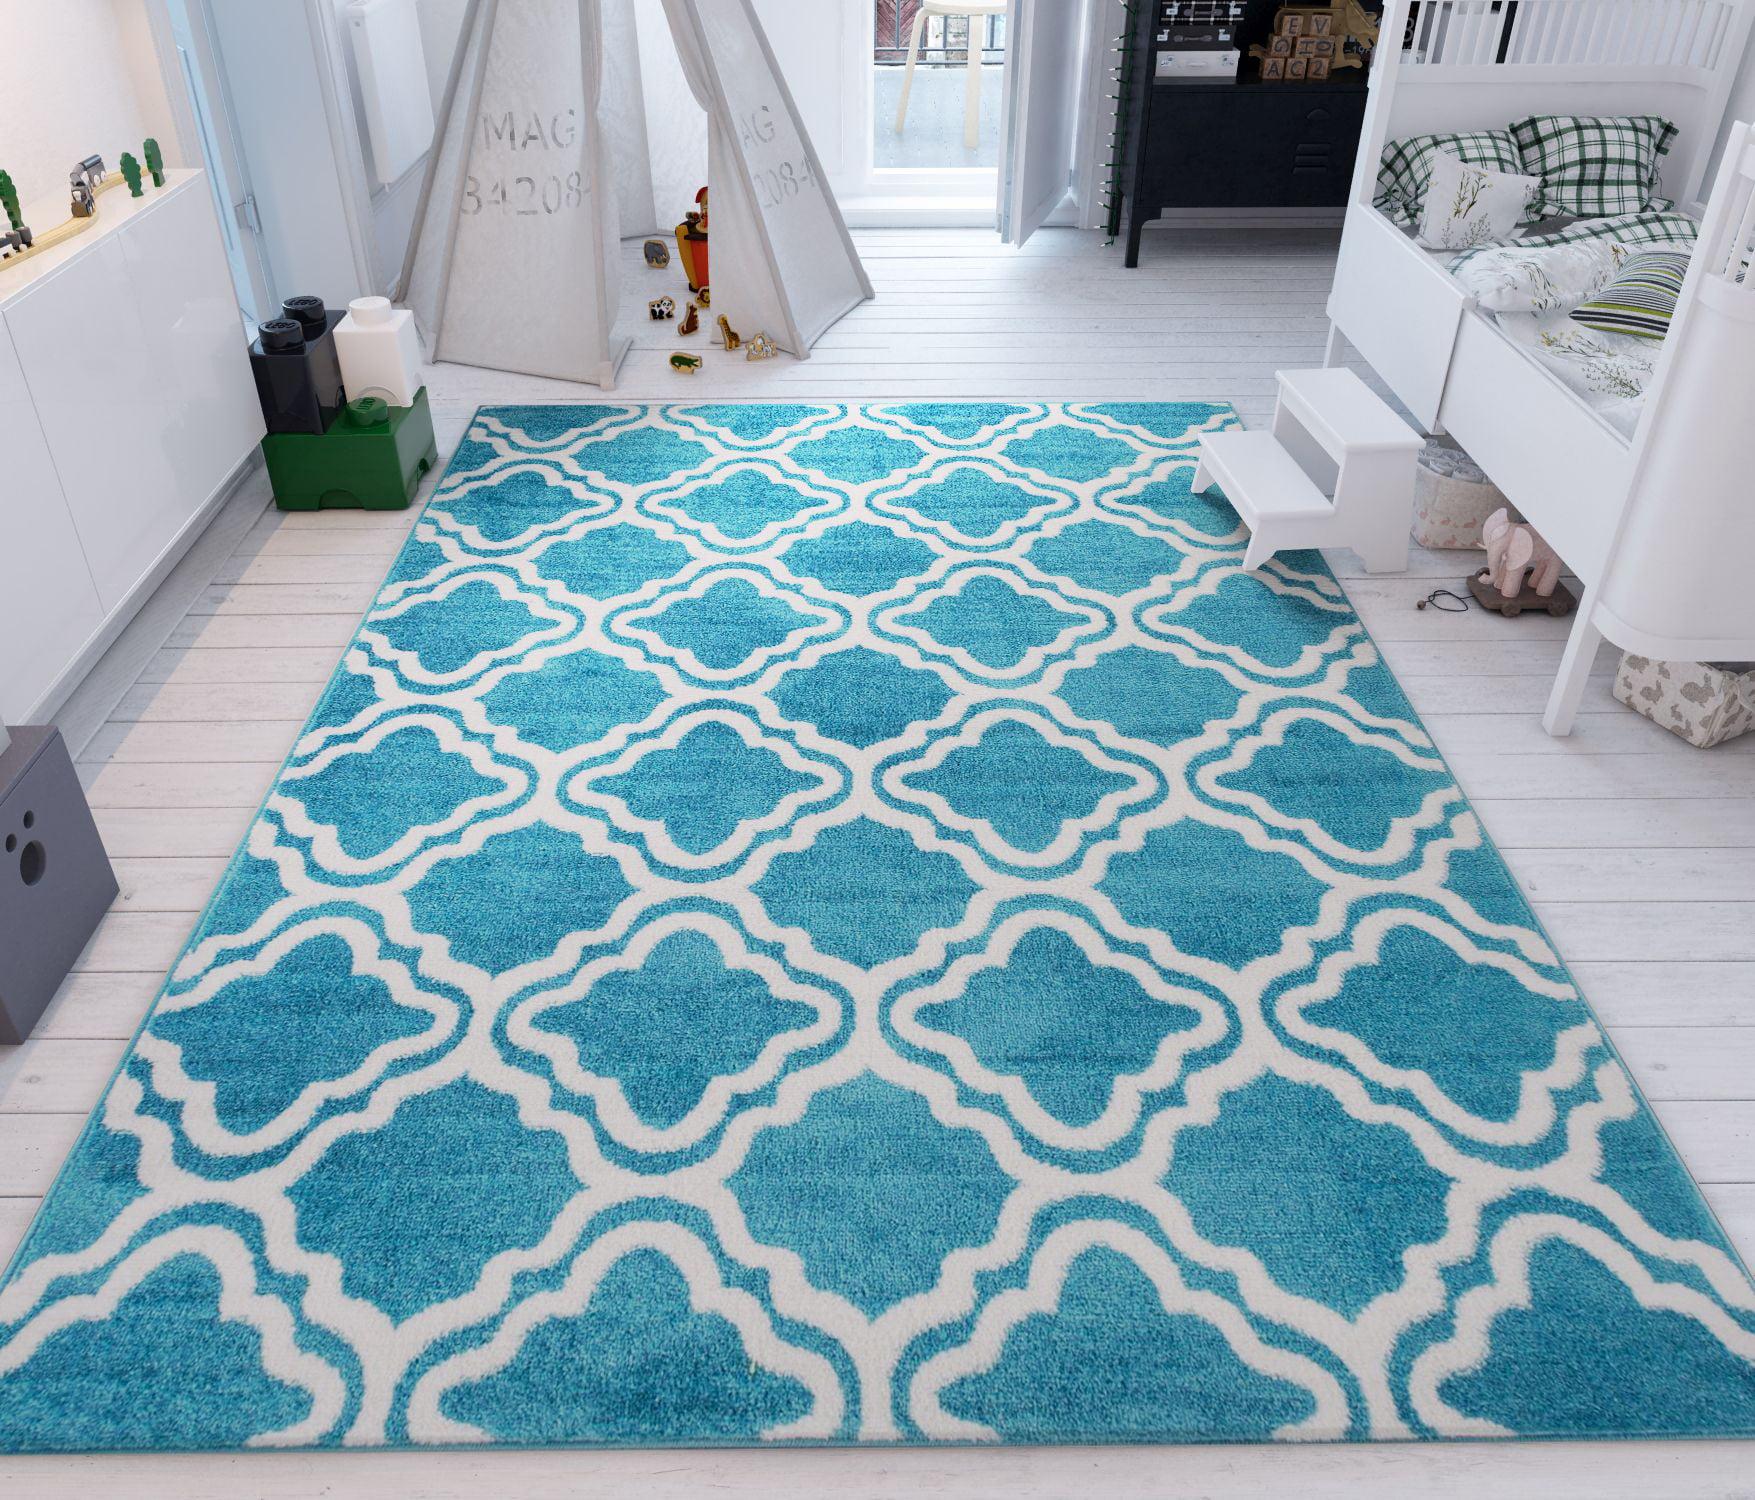 modern rug calipso blue 5'x7' lattice trellis accent area